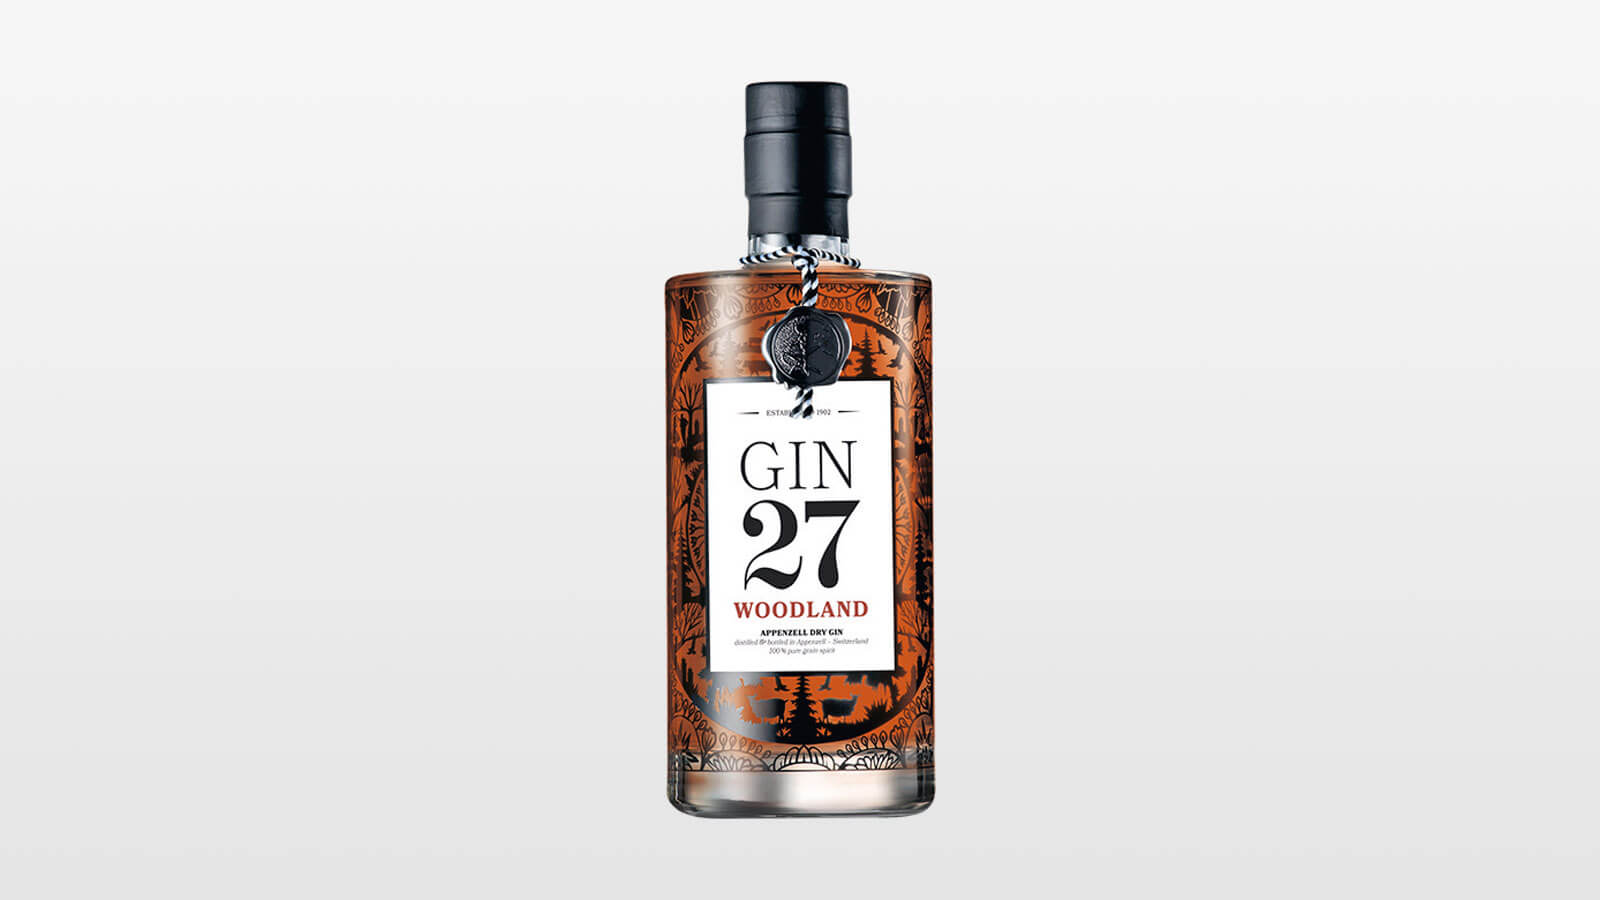 Gin 27 Woodland